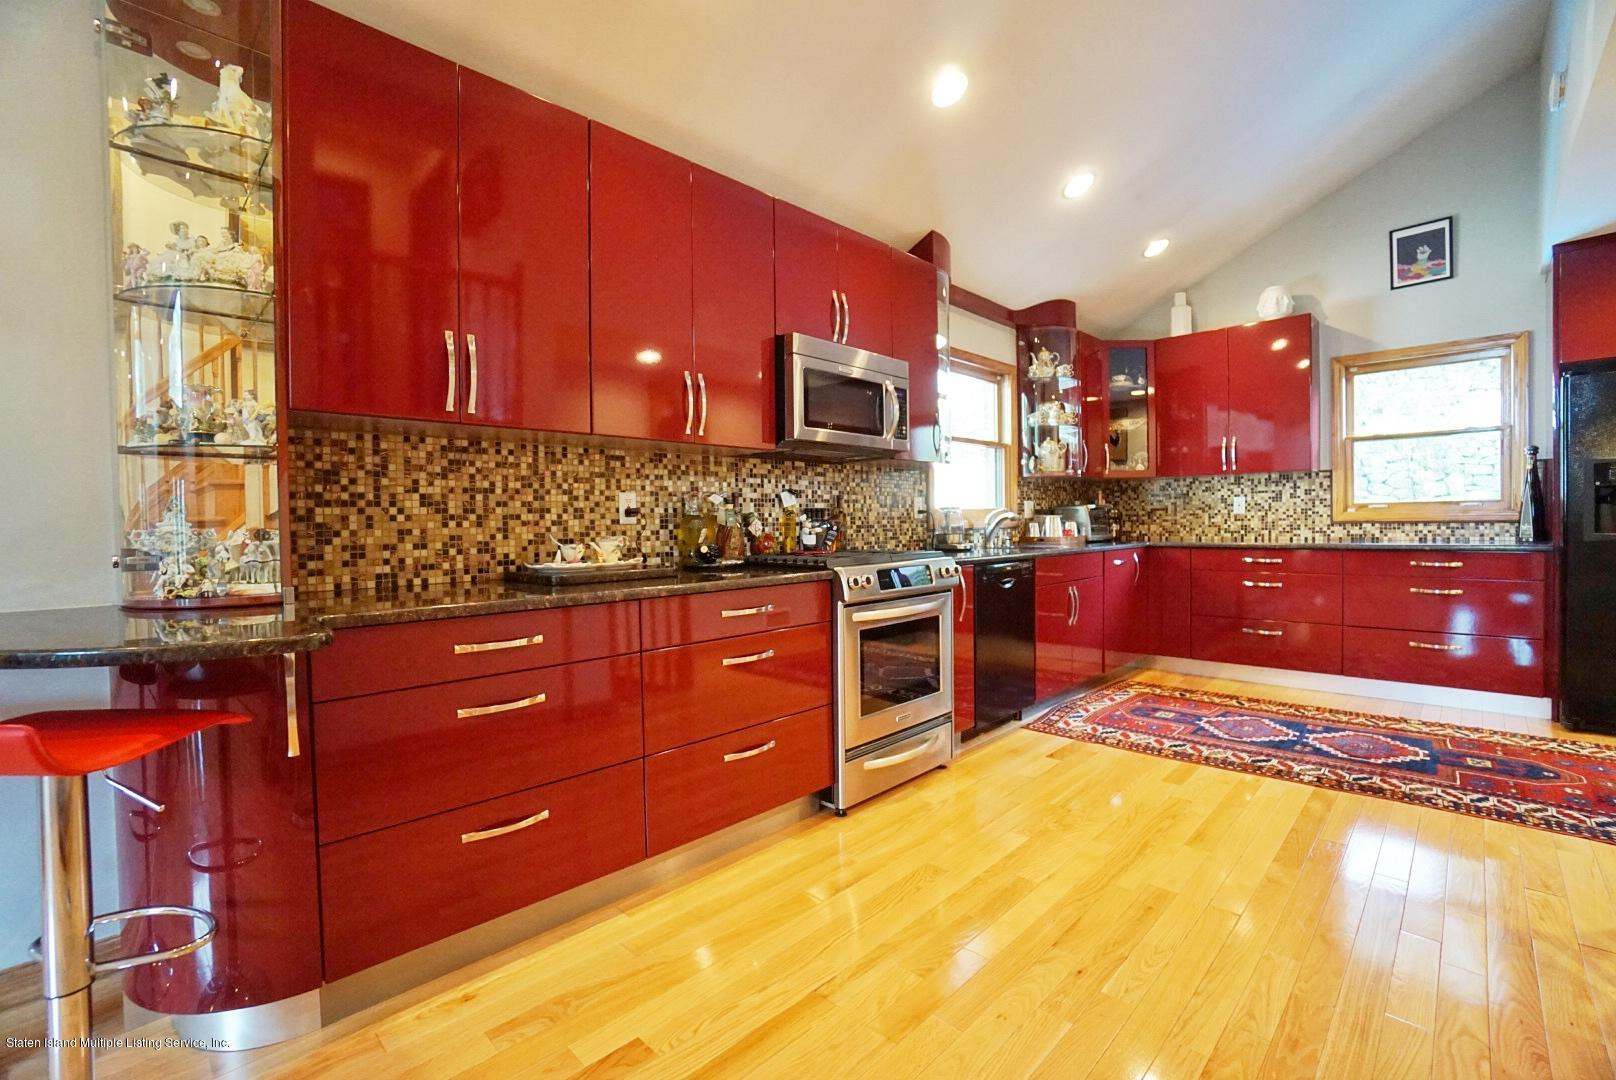 Single Family - Detached 48 Ocean Terrace  Staten Island, NY 10314, MLS-1130826-20